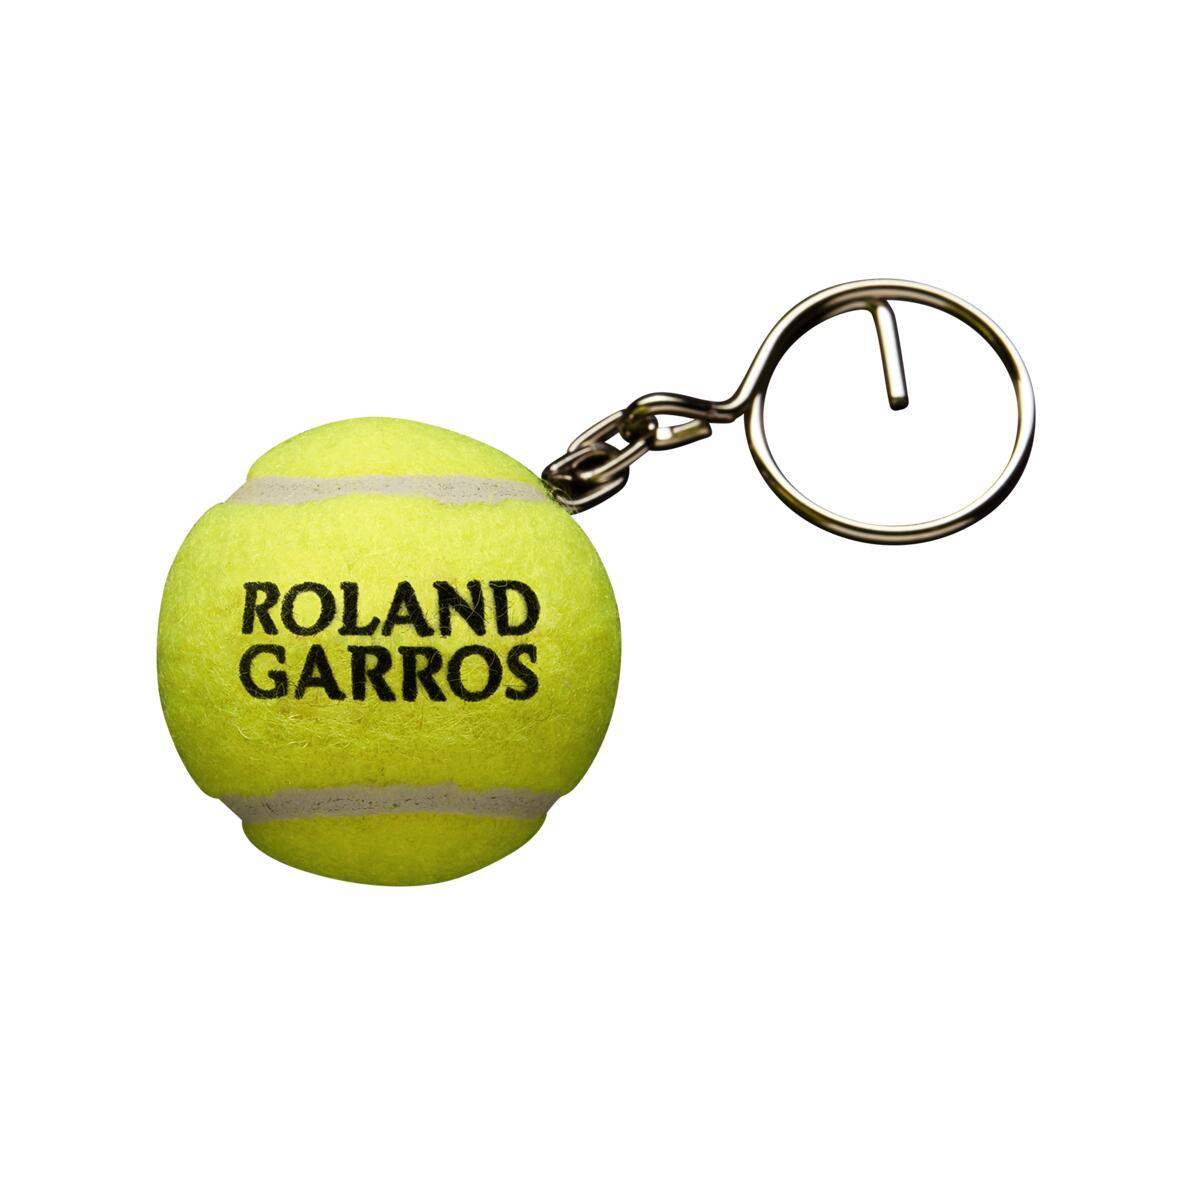 WR8401401_1_Roland_Garros_Tennis_Ball_Keychain_YE_Front.png.cq5dam.web.1200.1200